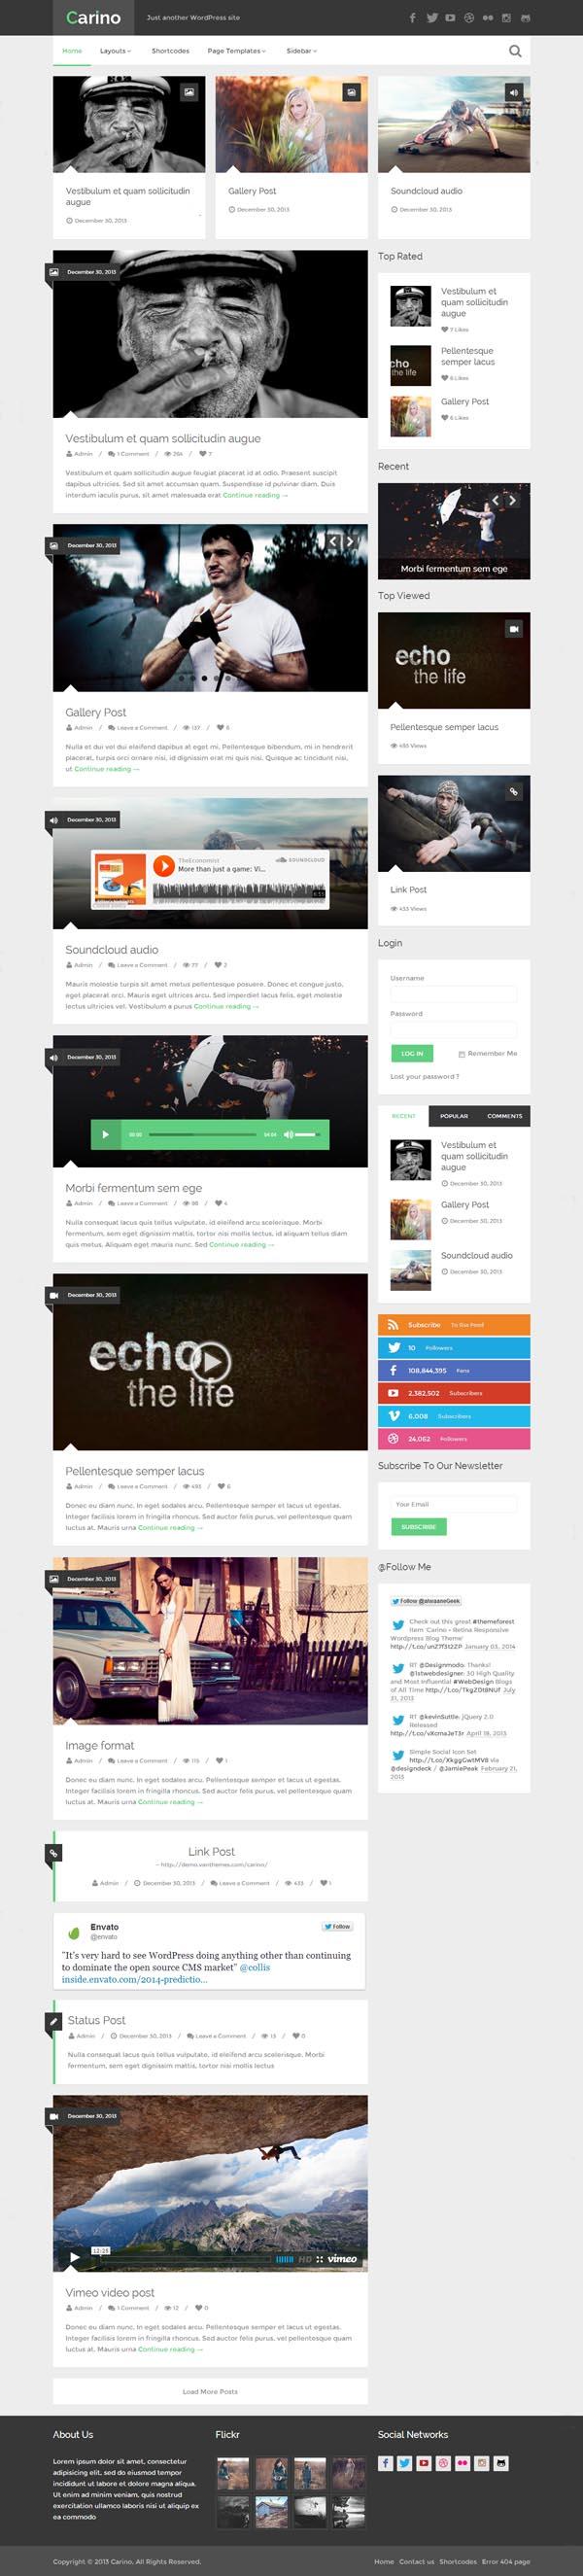 Carino - Retina Responsive WordPress Blog Theme